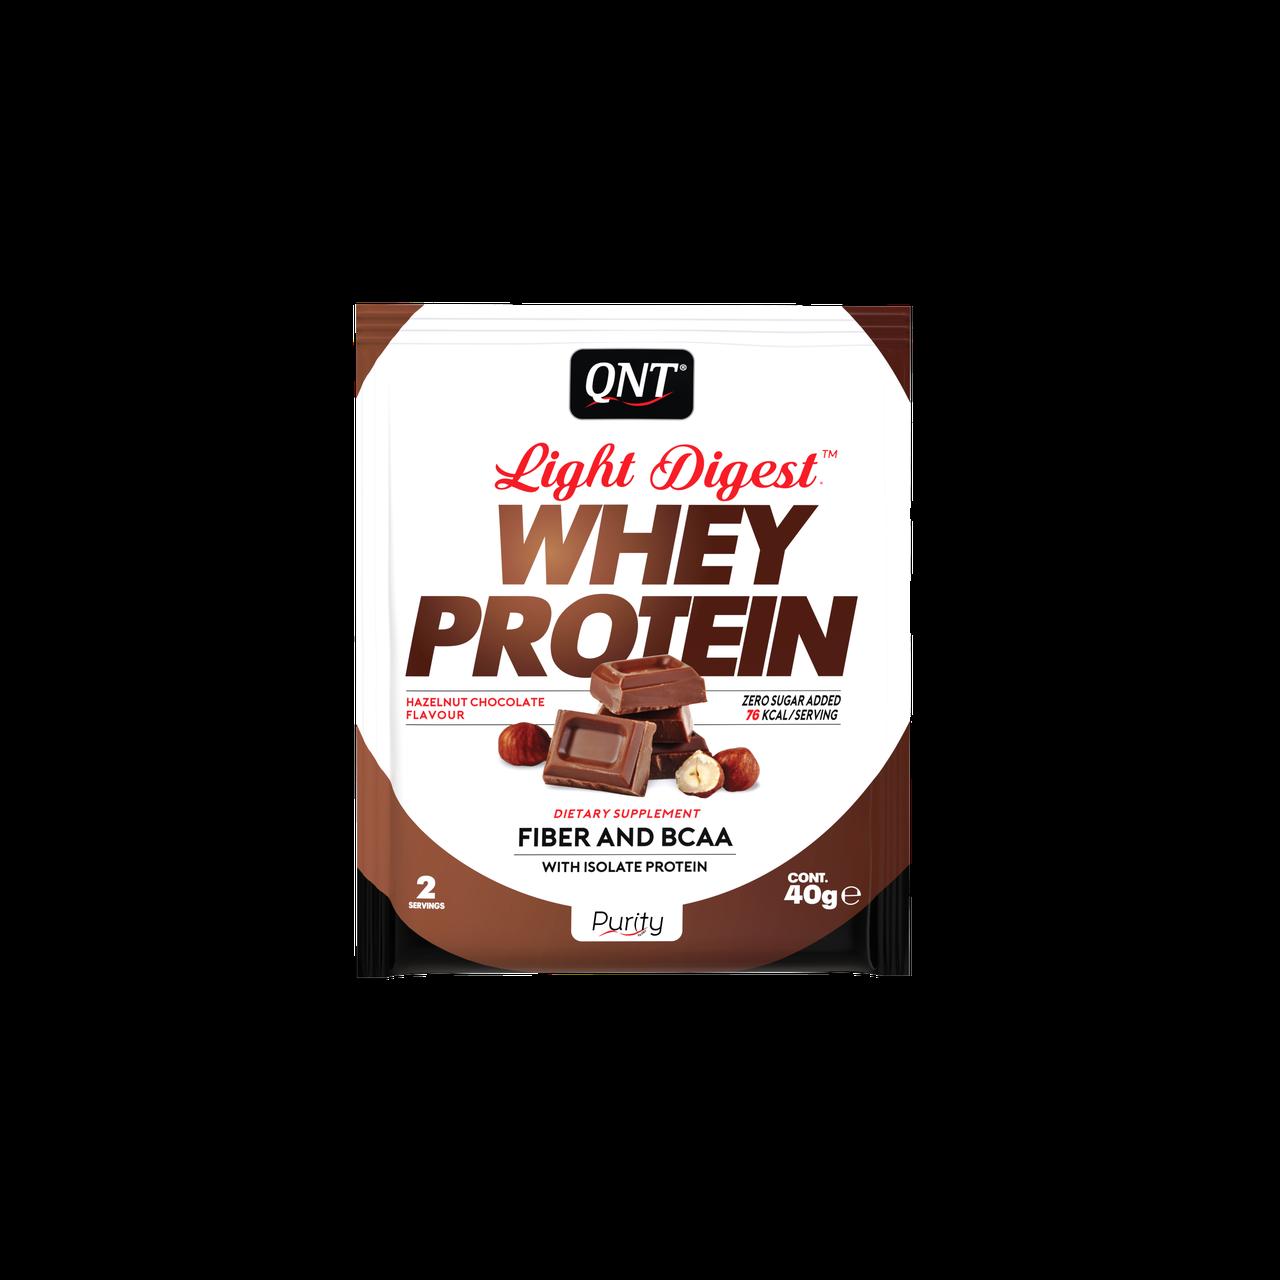 QNT_Light Digest Whey Protein 500 г - Nut/Chocolate